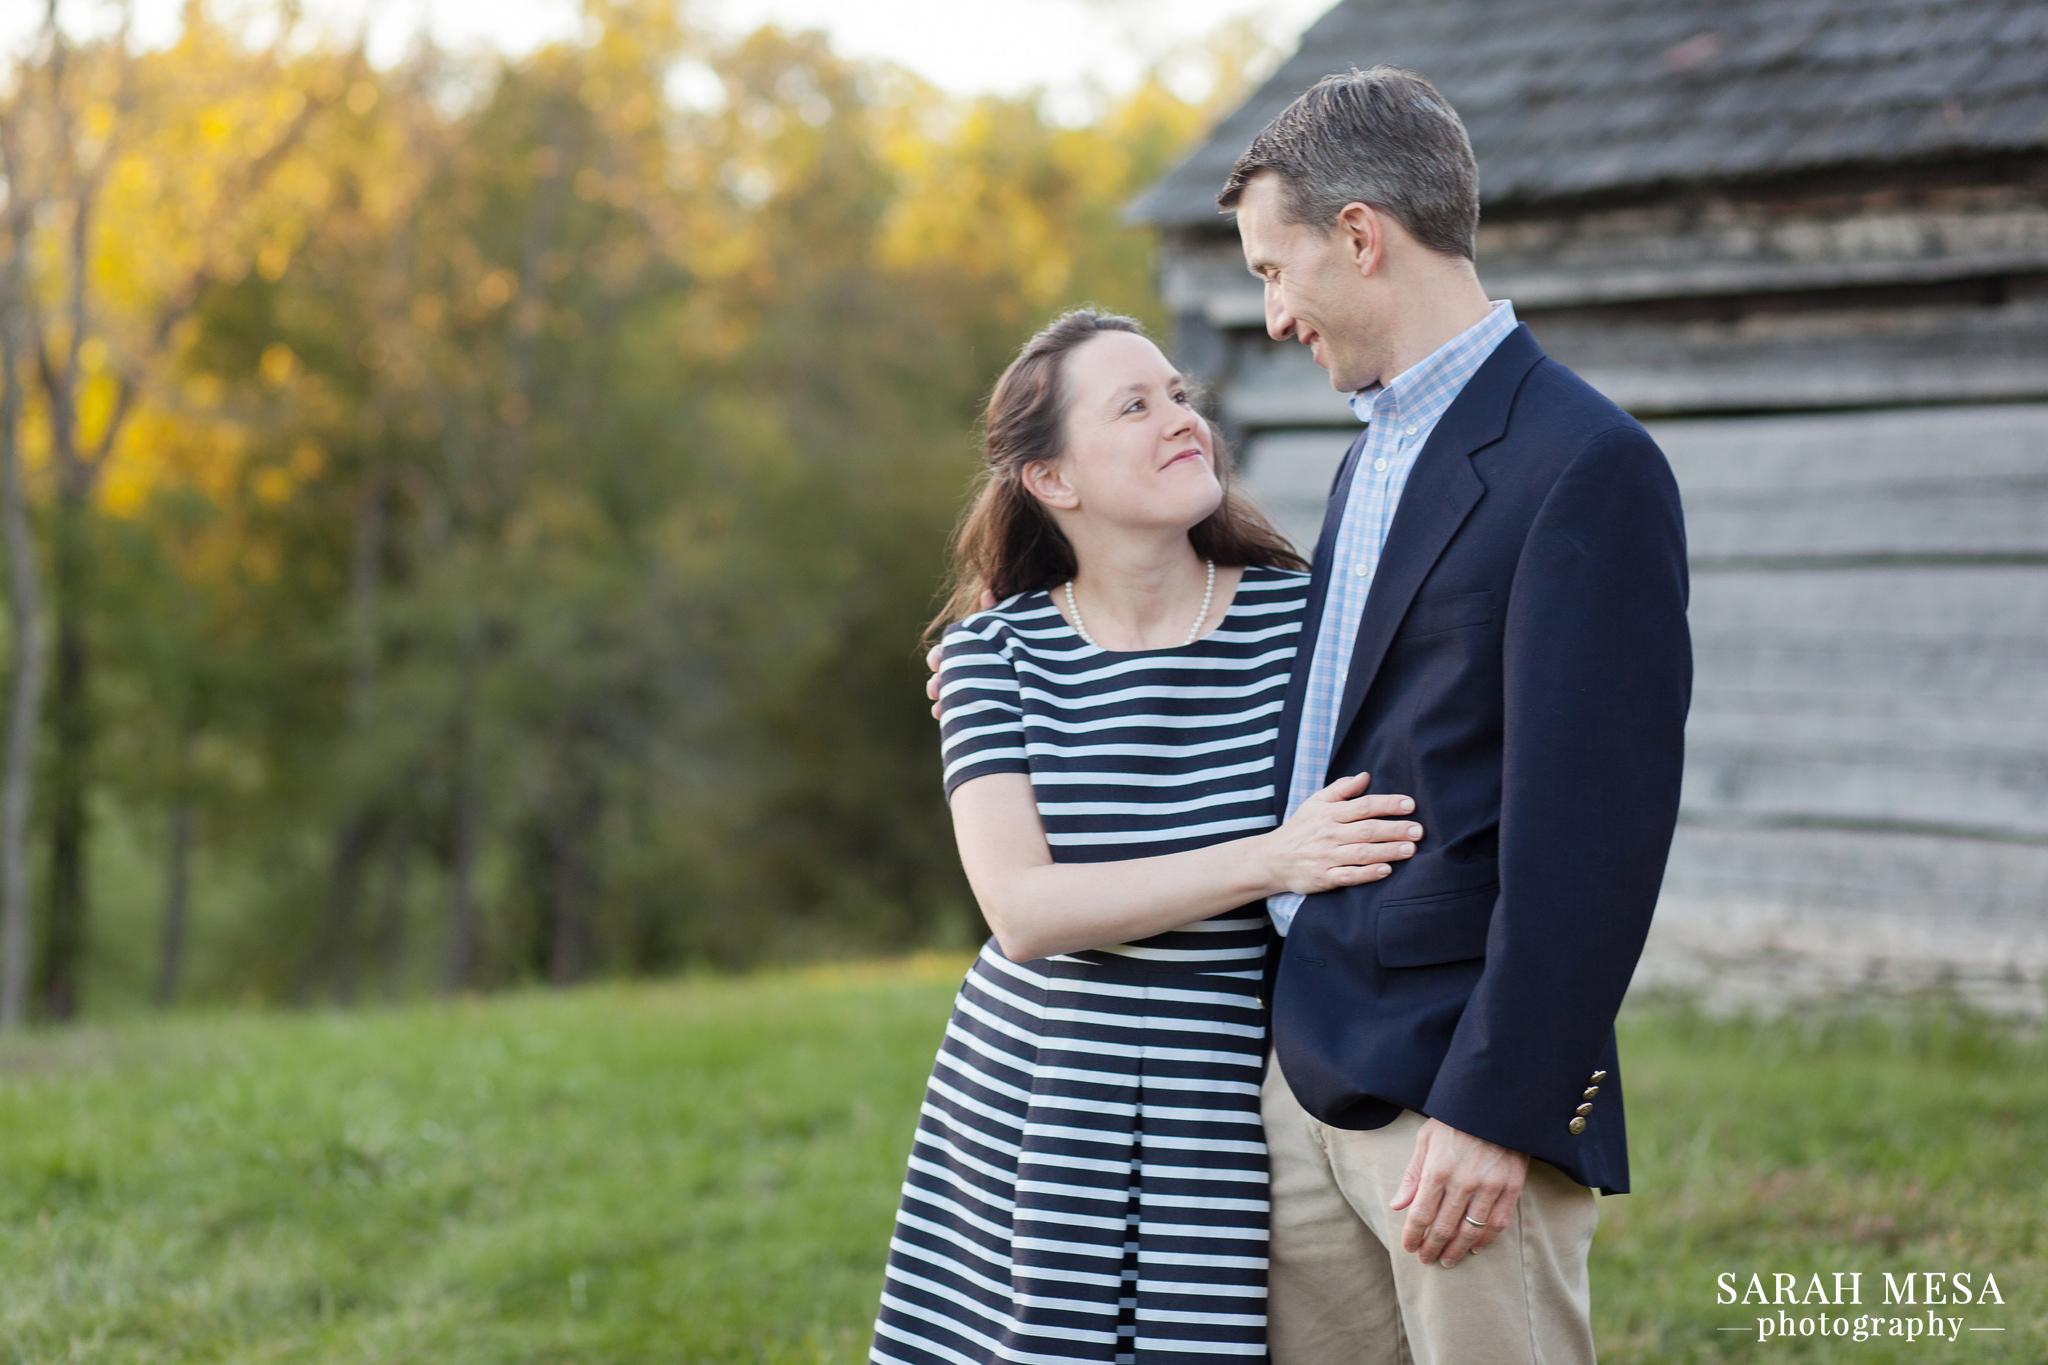 Sarah Mesa Photography   Louisville, KY Wedding and Portrait Photographer